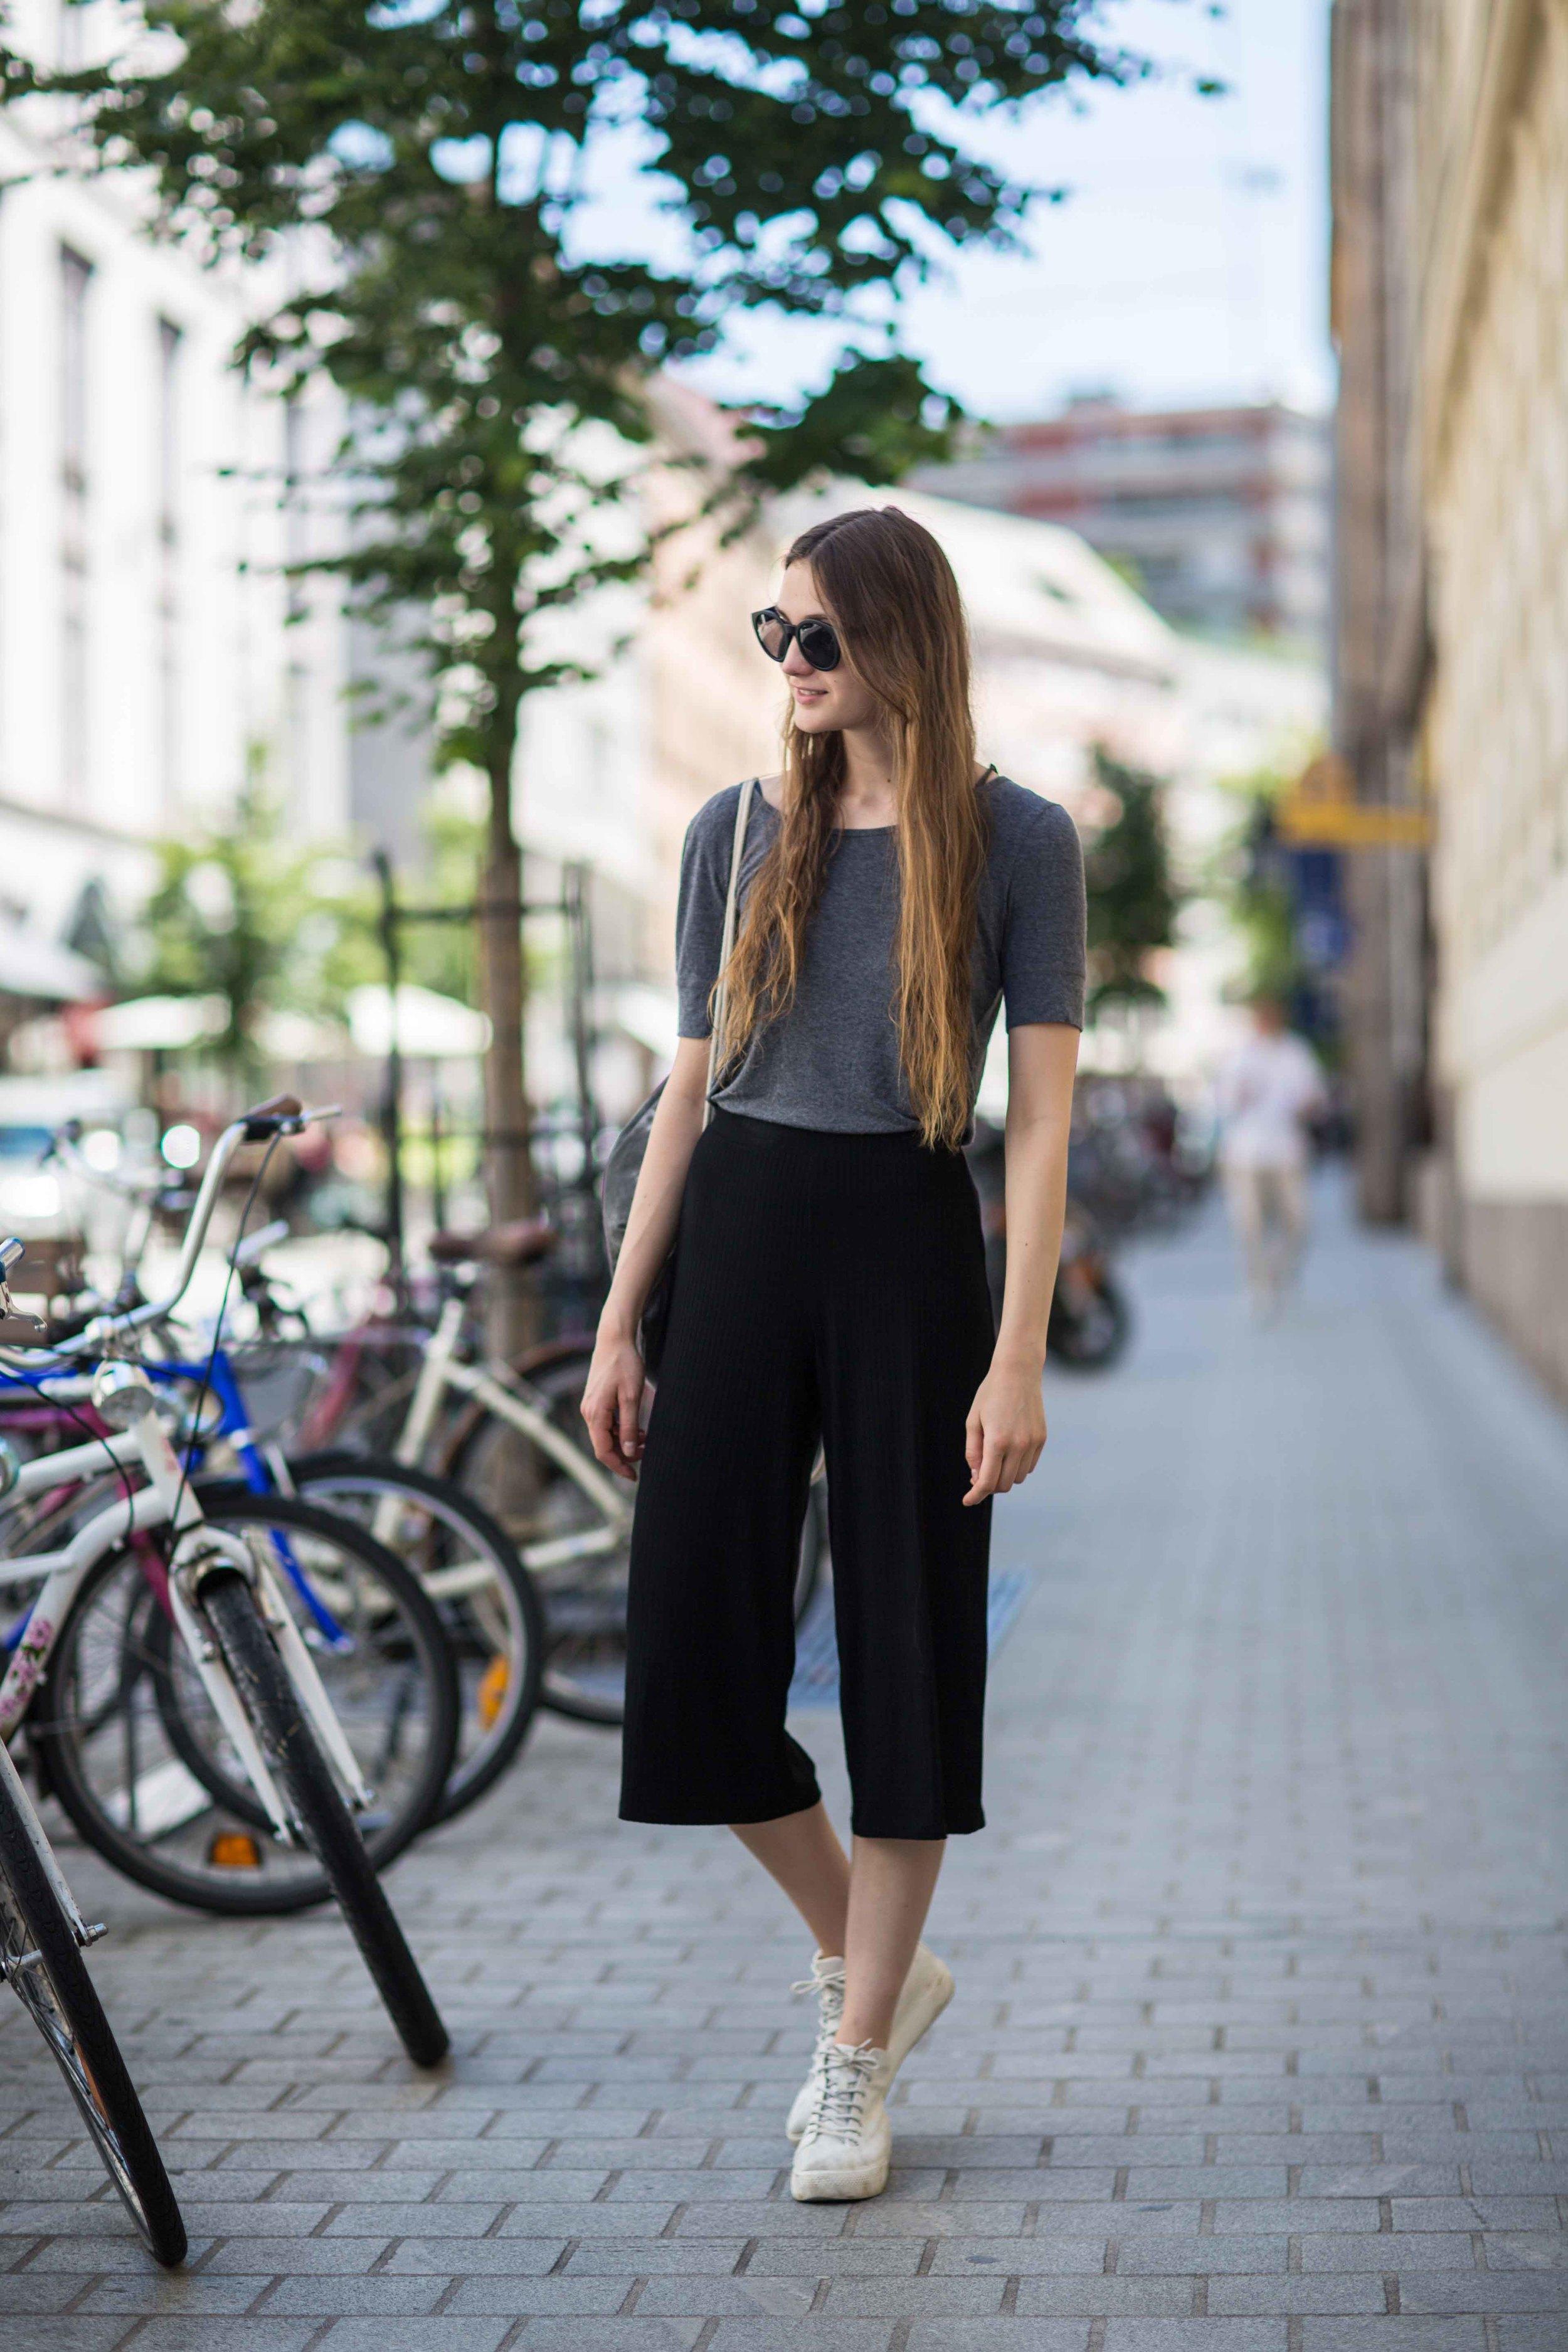 street-style-fashion-blog-innsbruck-elena